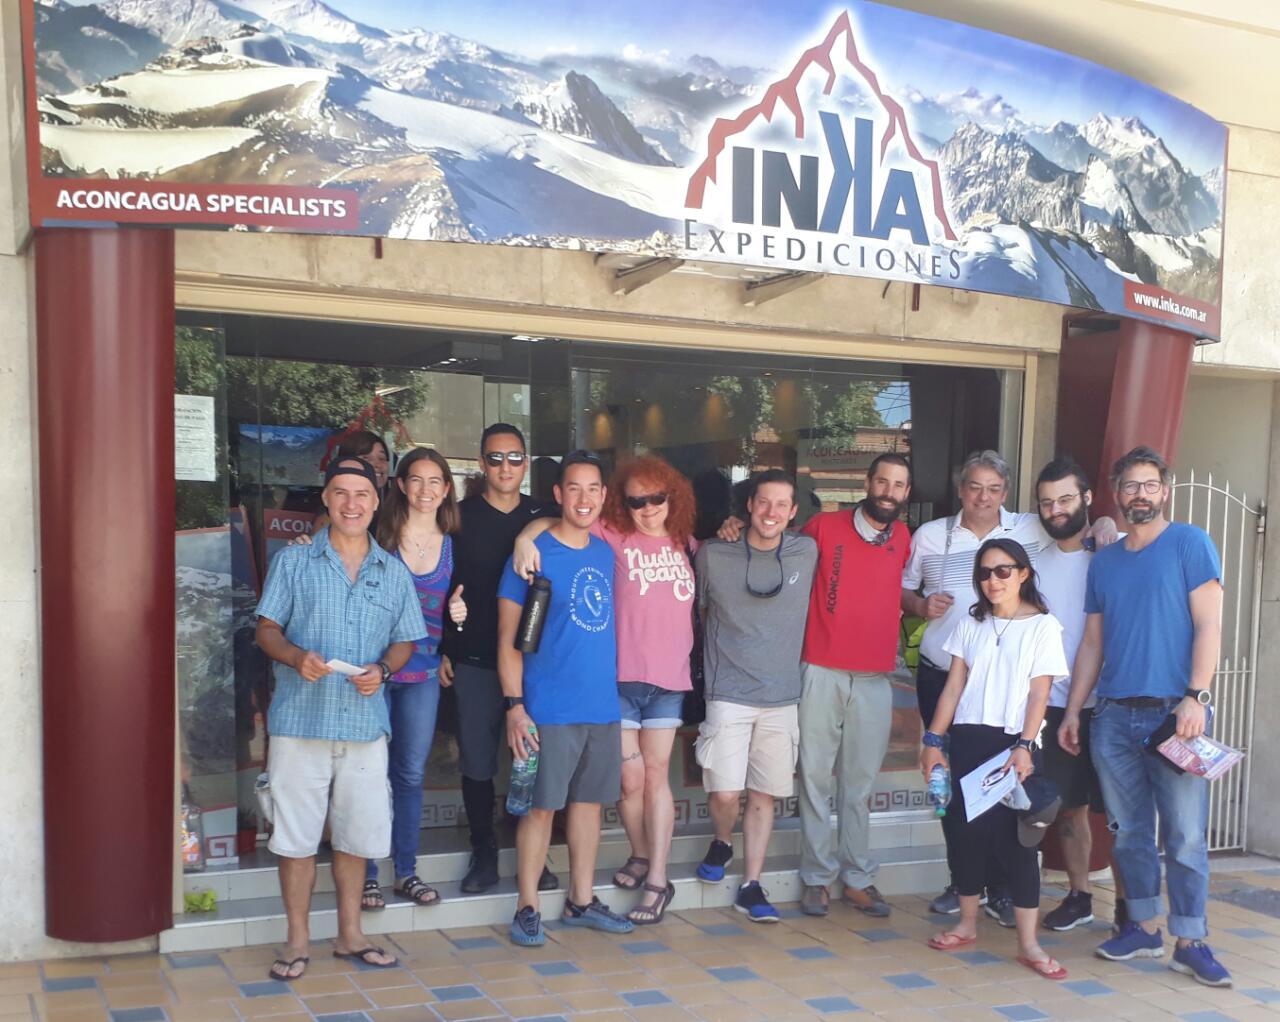 inka expediciones staff